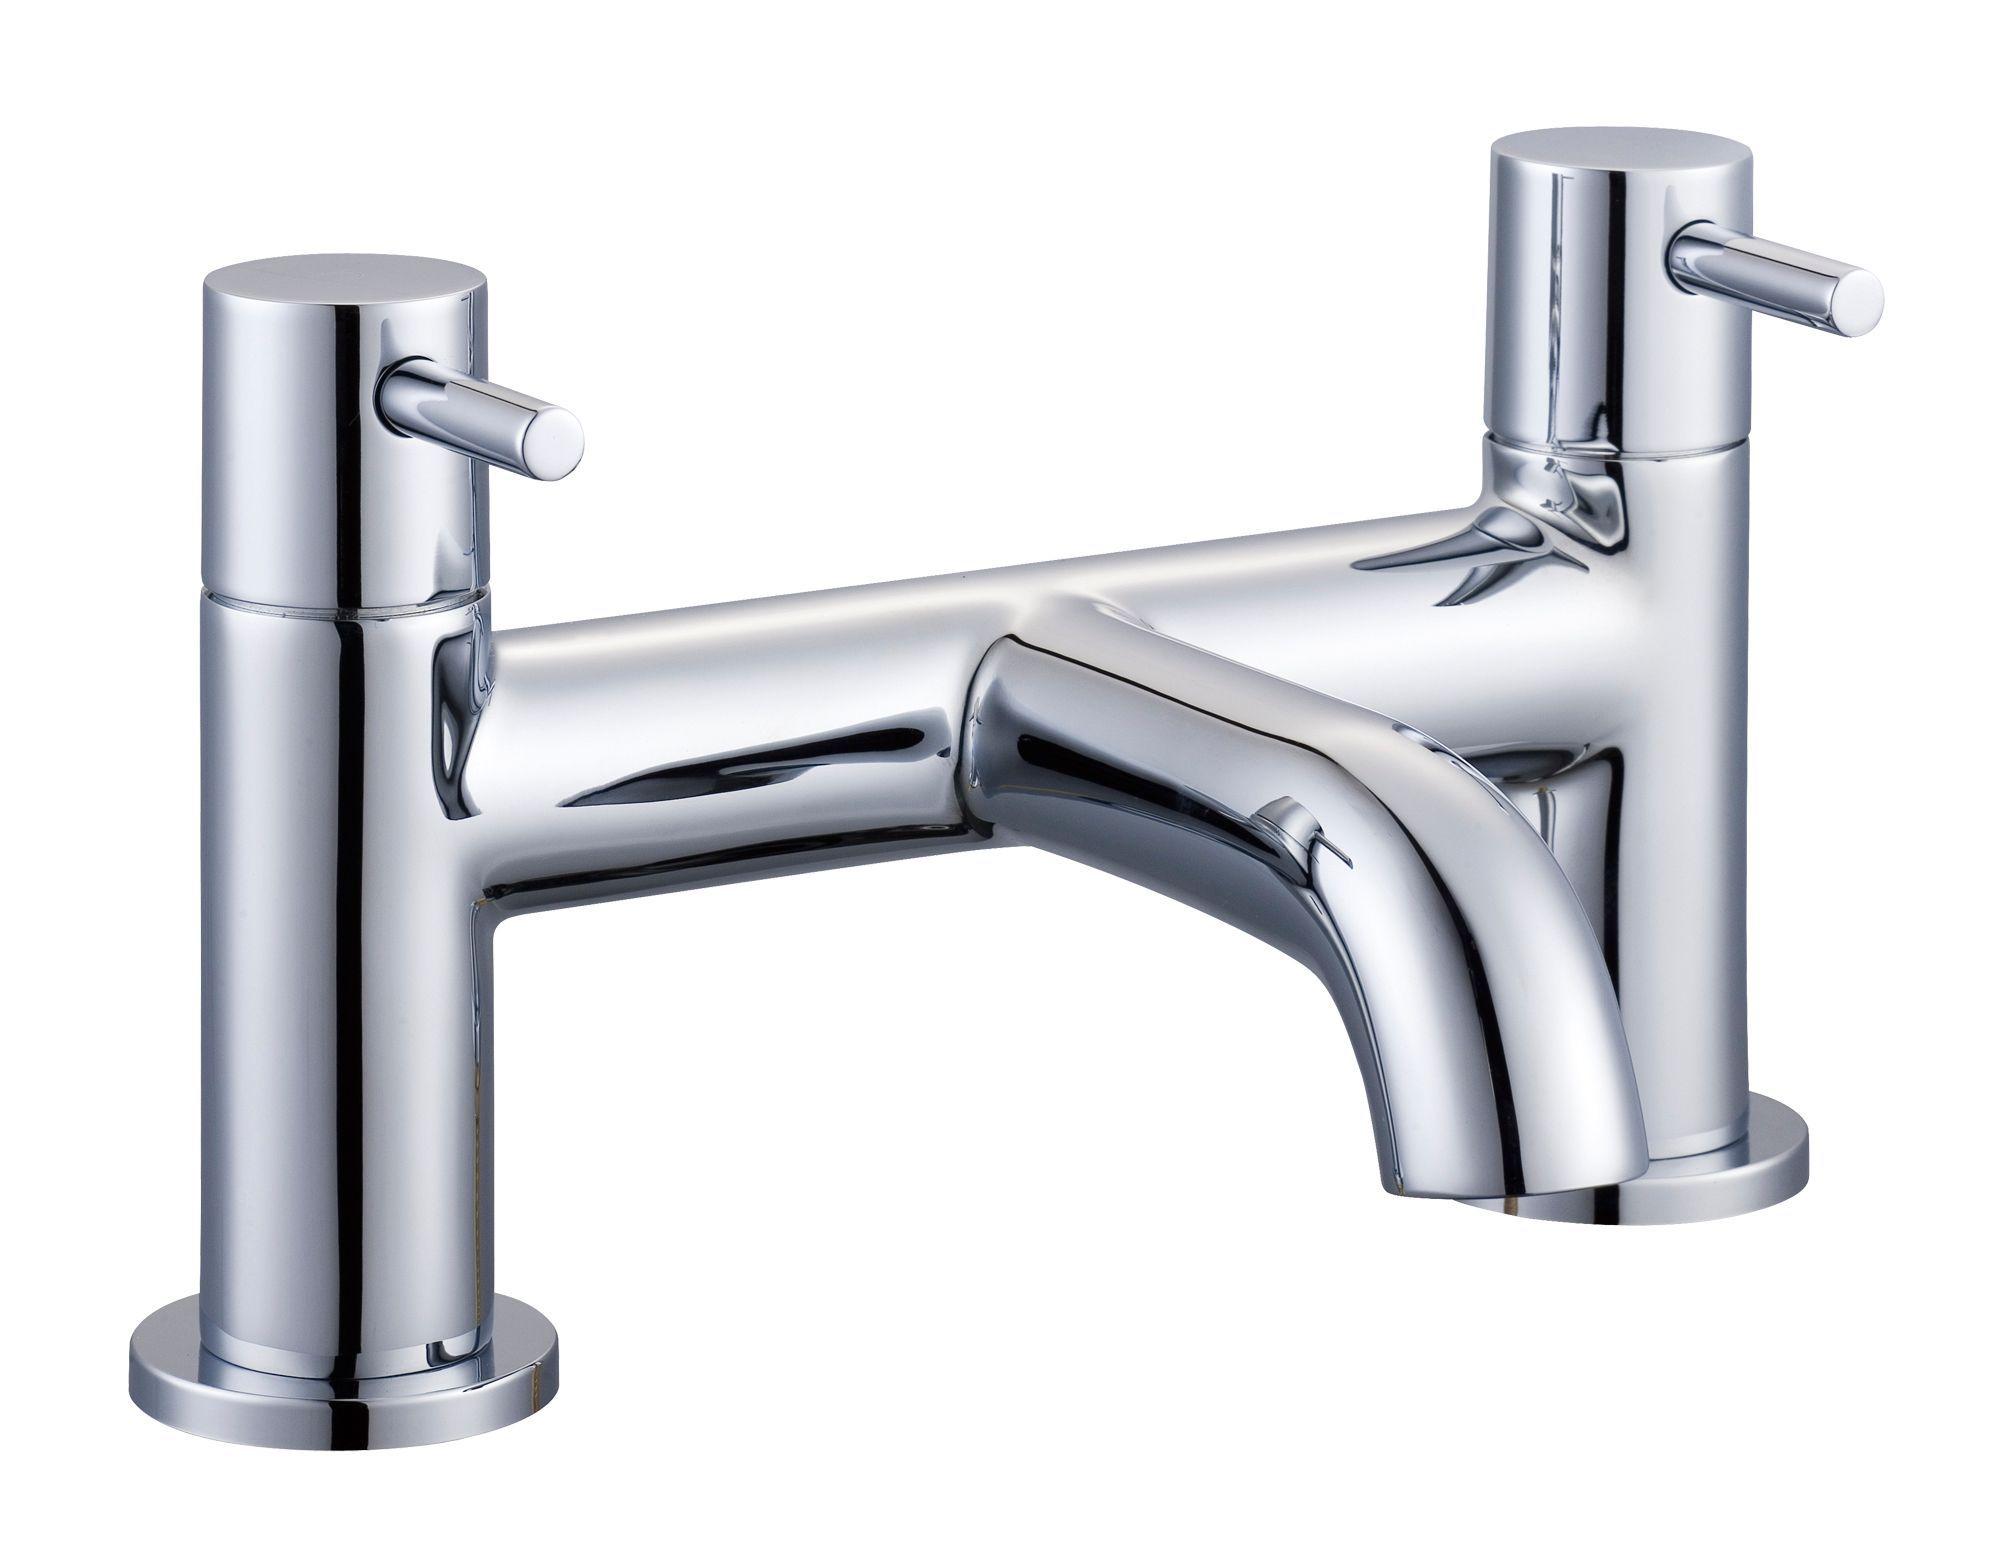 Cooke & Lewis Minima Chrome finish Bath mixer tap | Bathroom ...